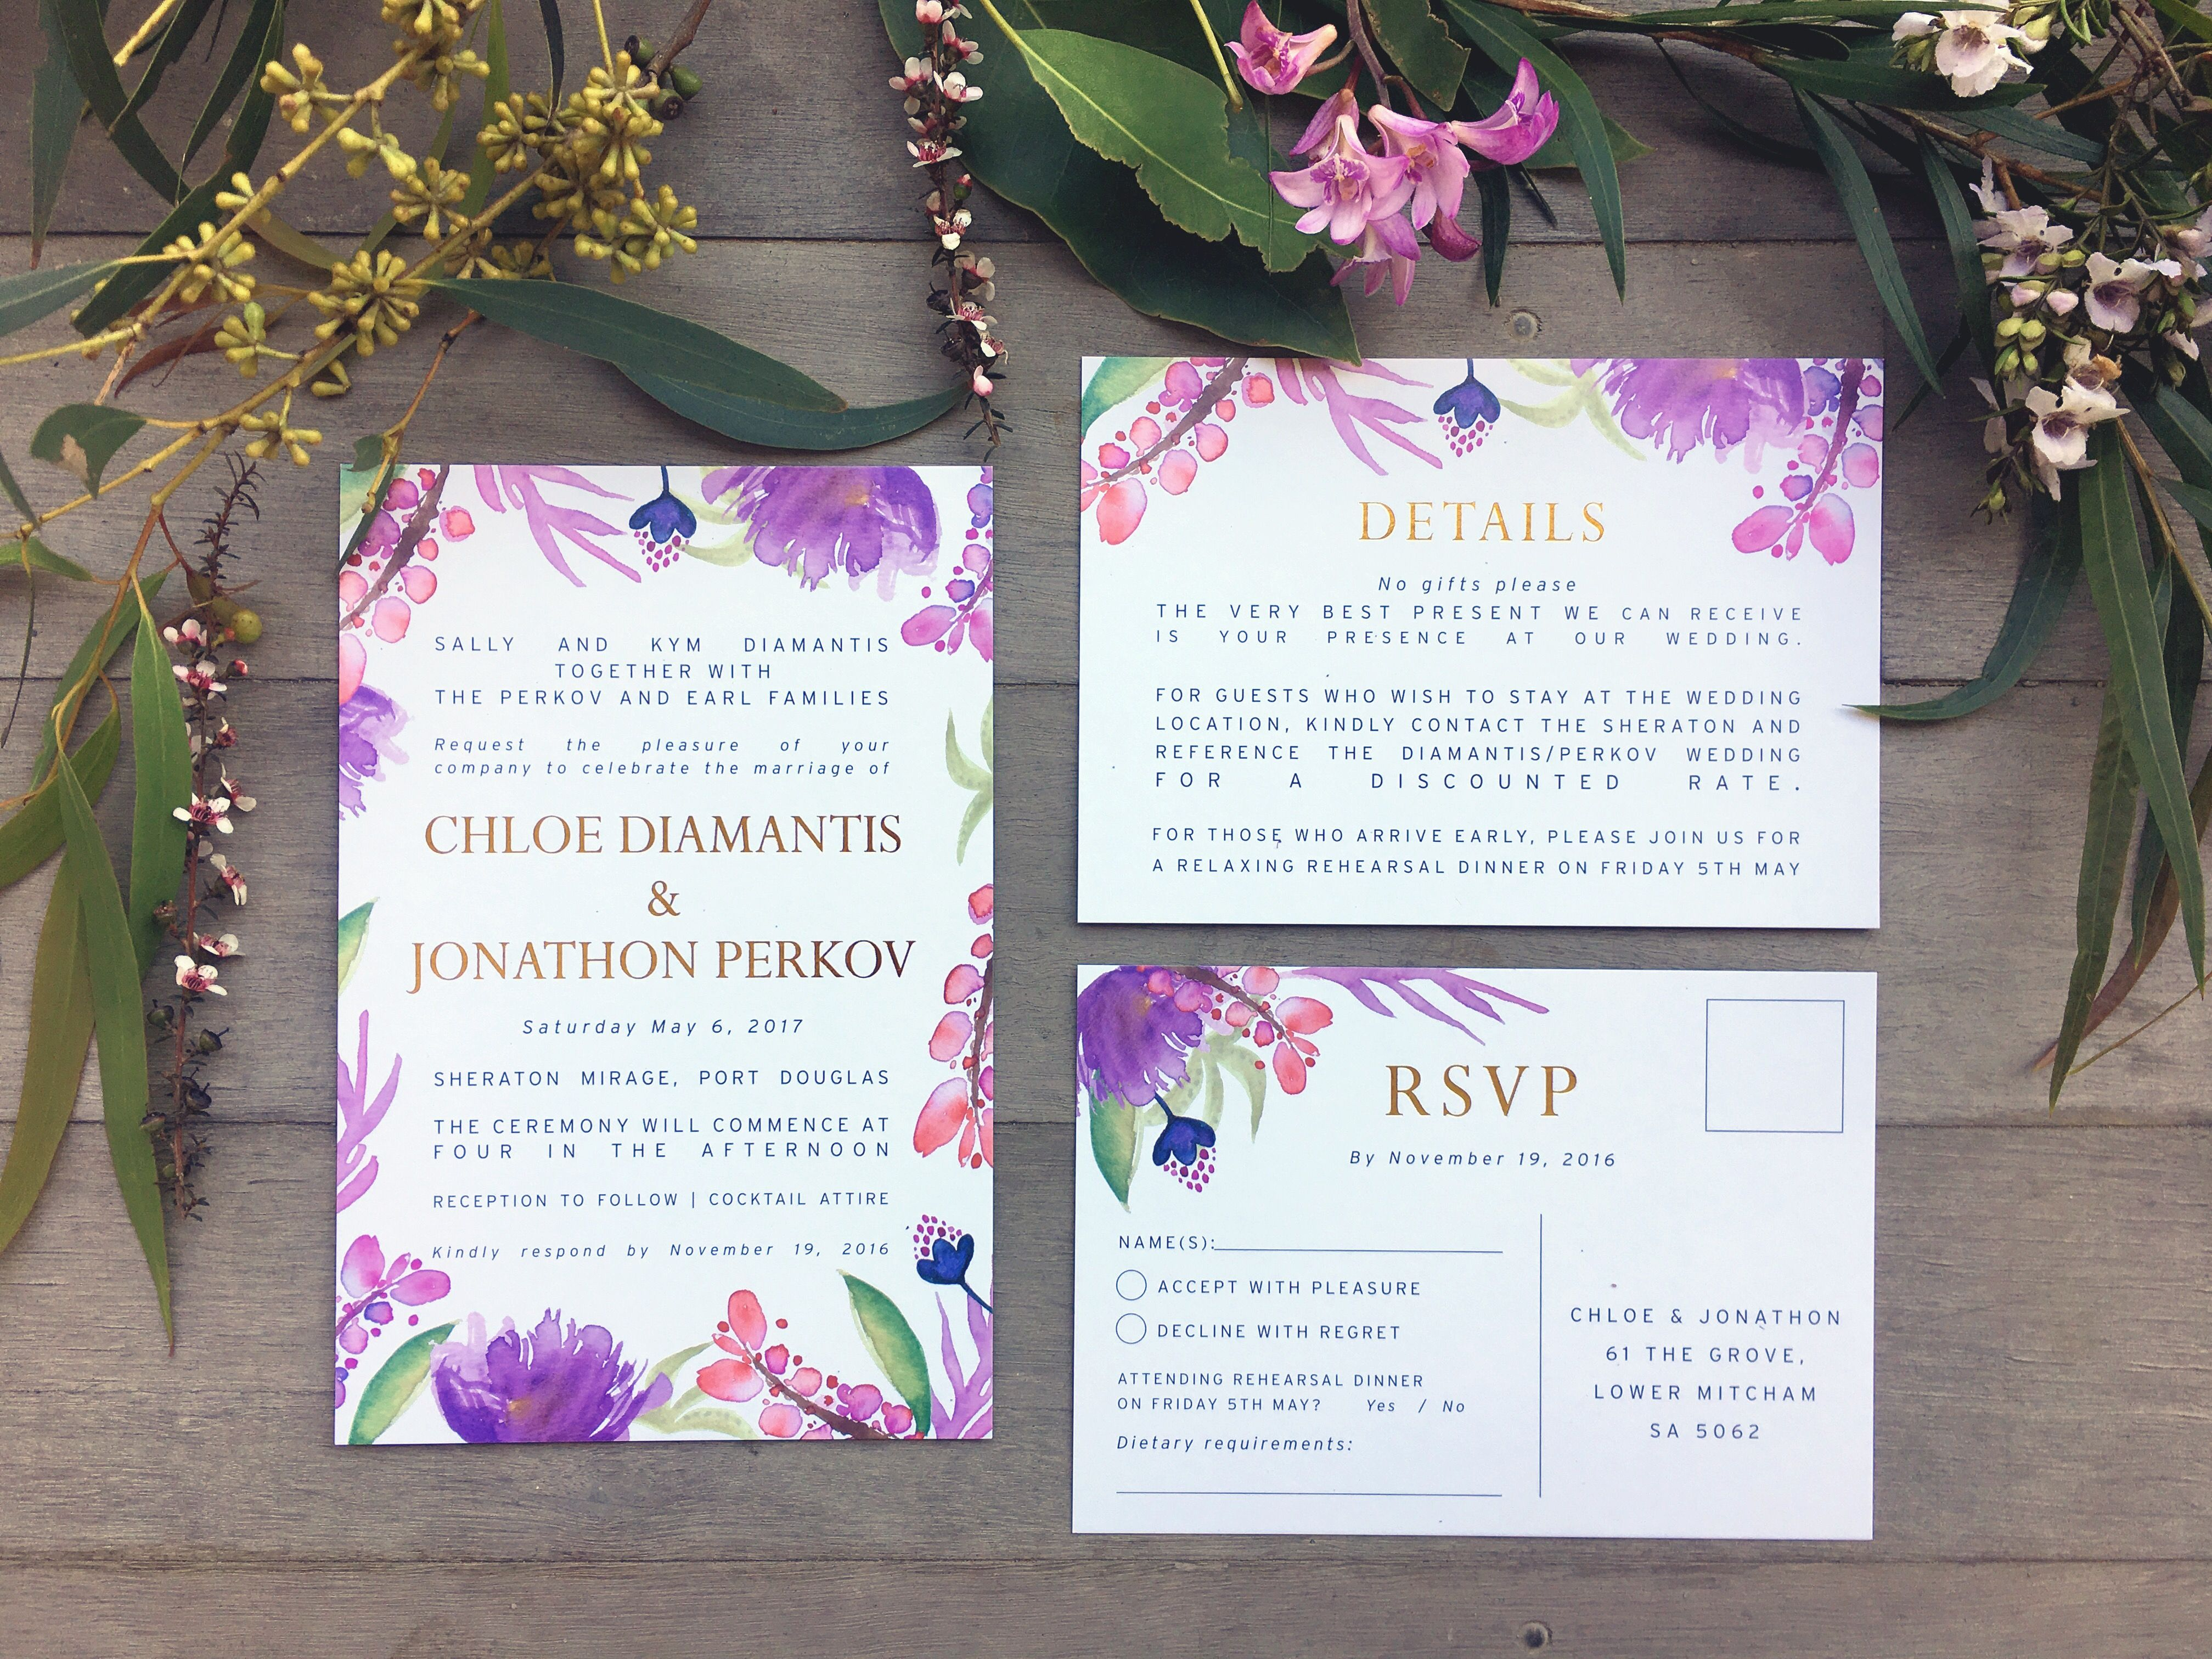 sample wording for rsvp wedding invitations%0A Tropical purple island destination Hawaii Bali Fiji bora bora Maui  Queensland port Douglas gold foil RSVP    Invitation DesignBest QualityFiji Wedding